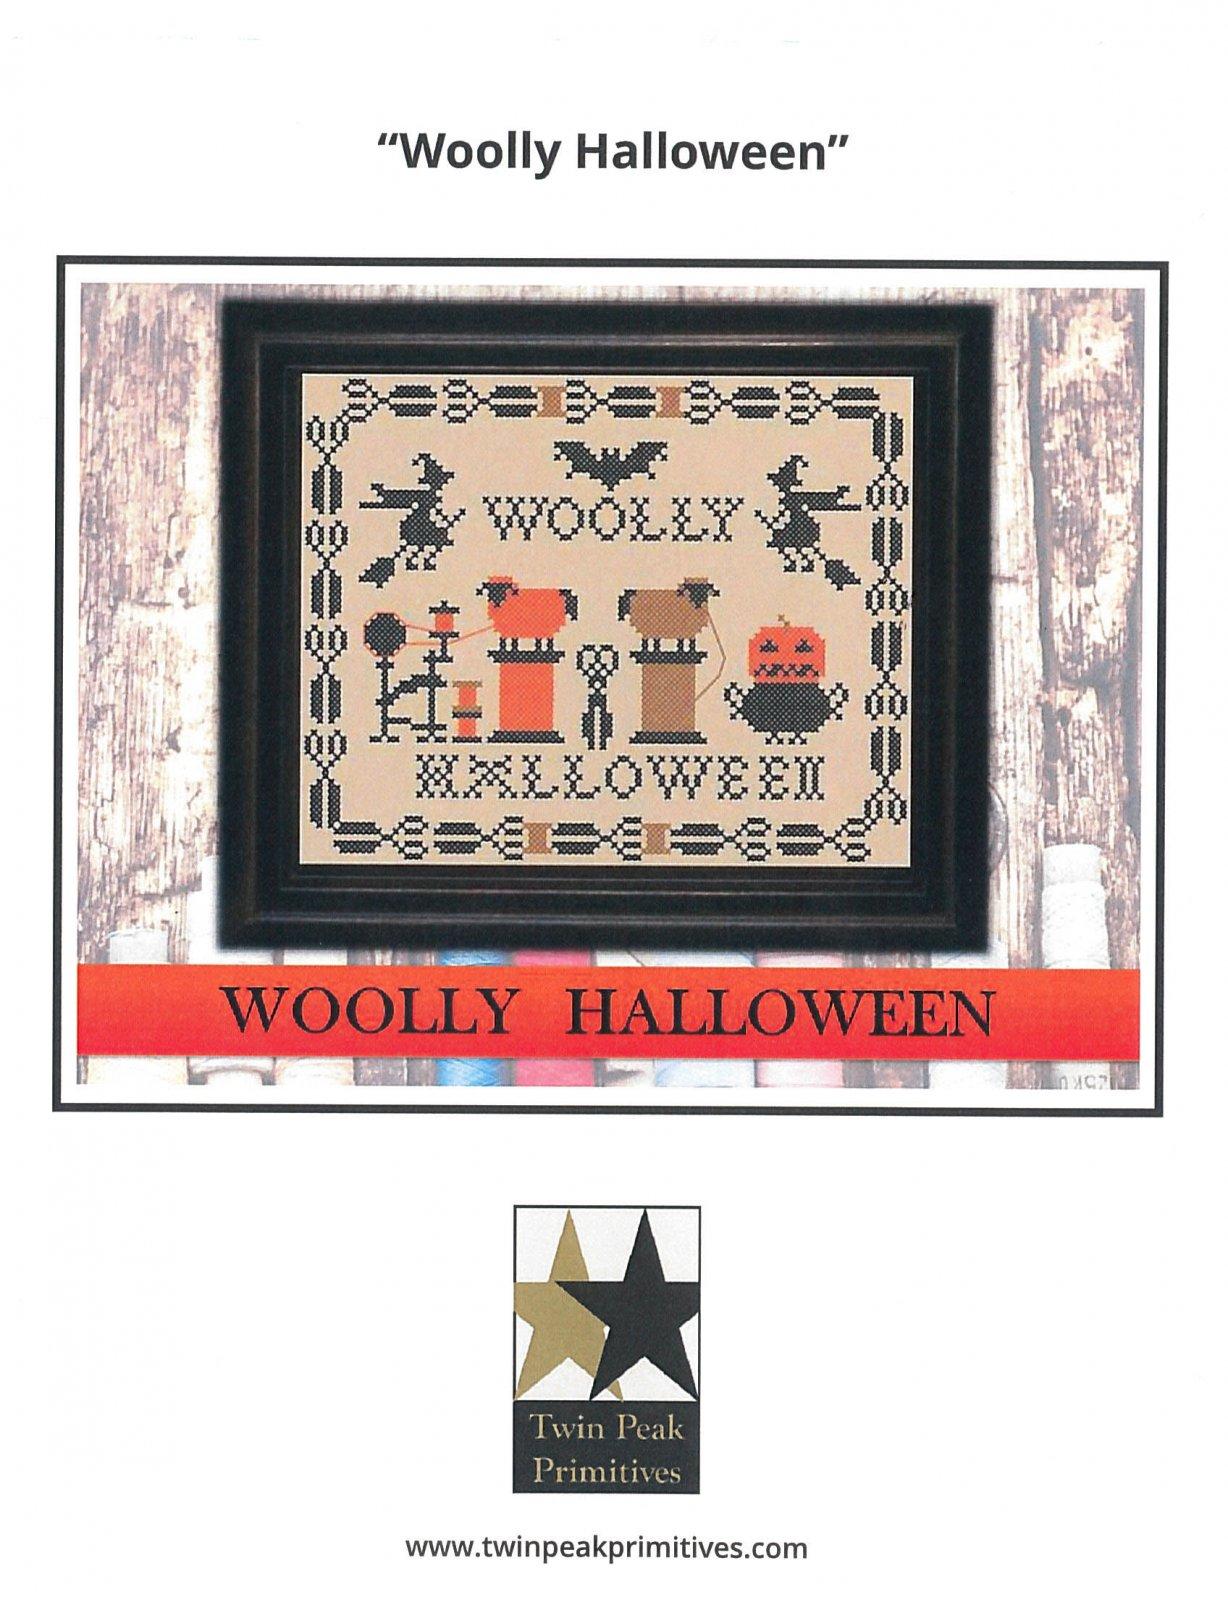 TPP Woolly Halloween